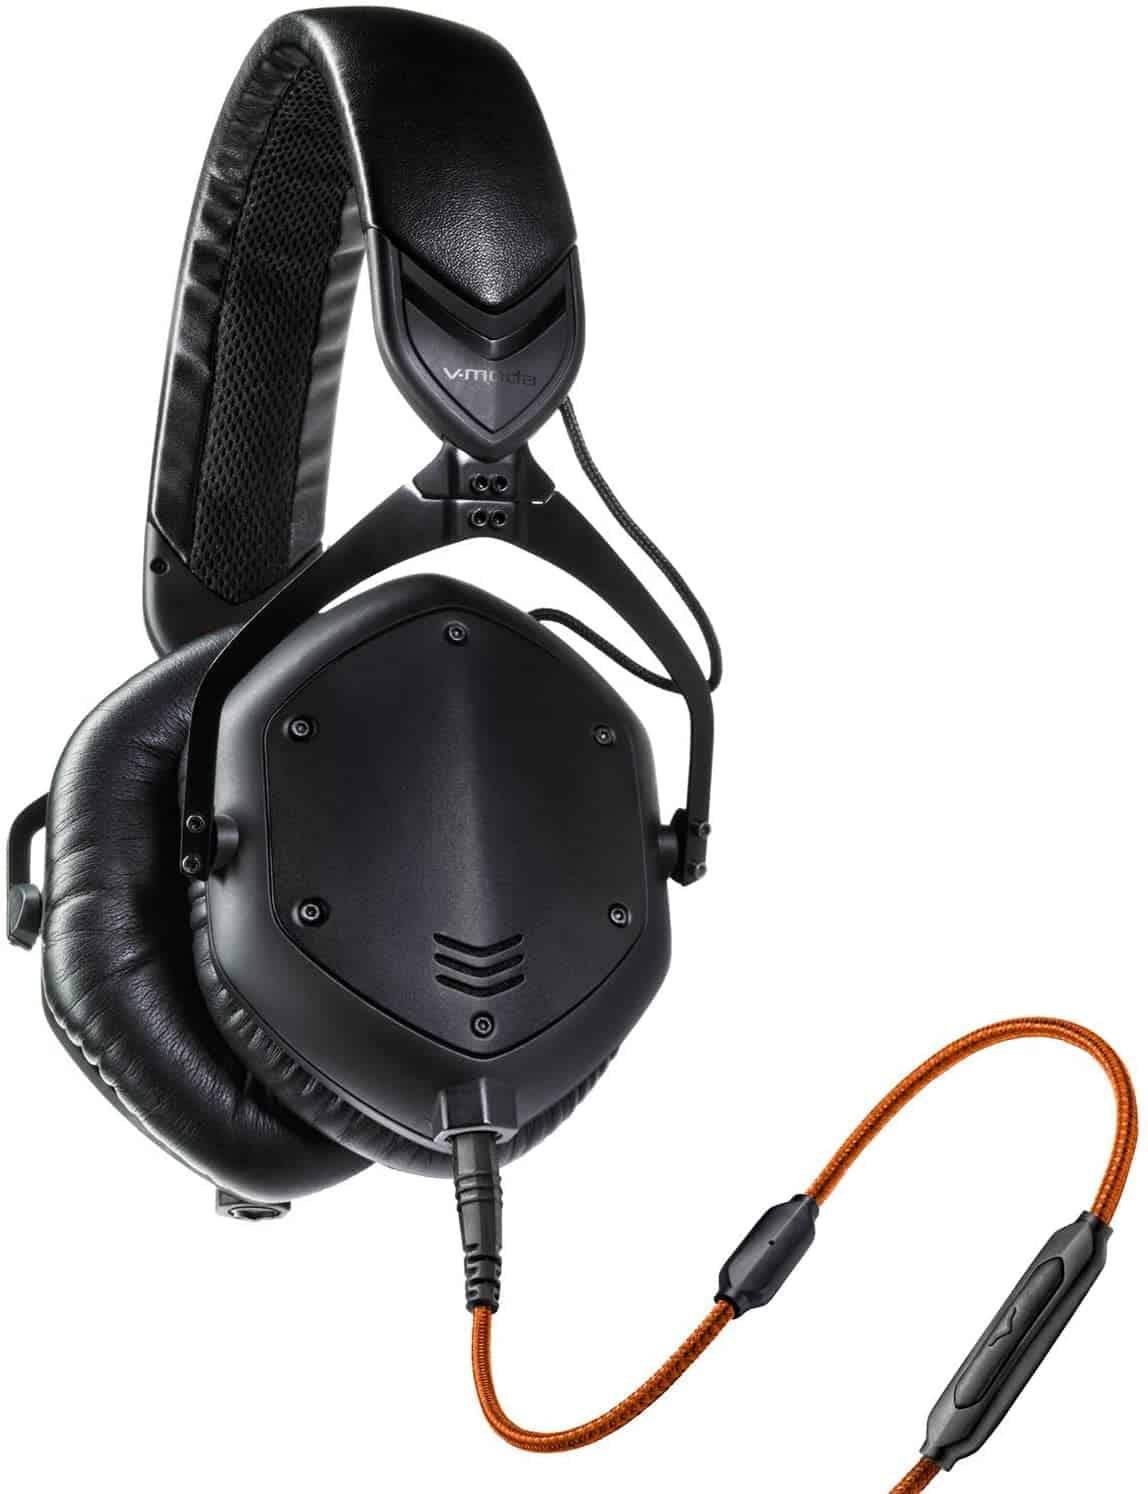 V-MODA Crossfade M-100 Metal Headphone